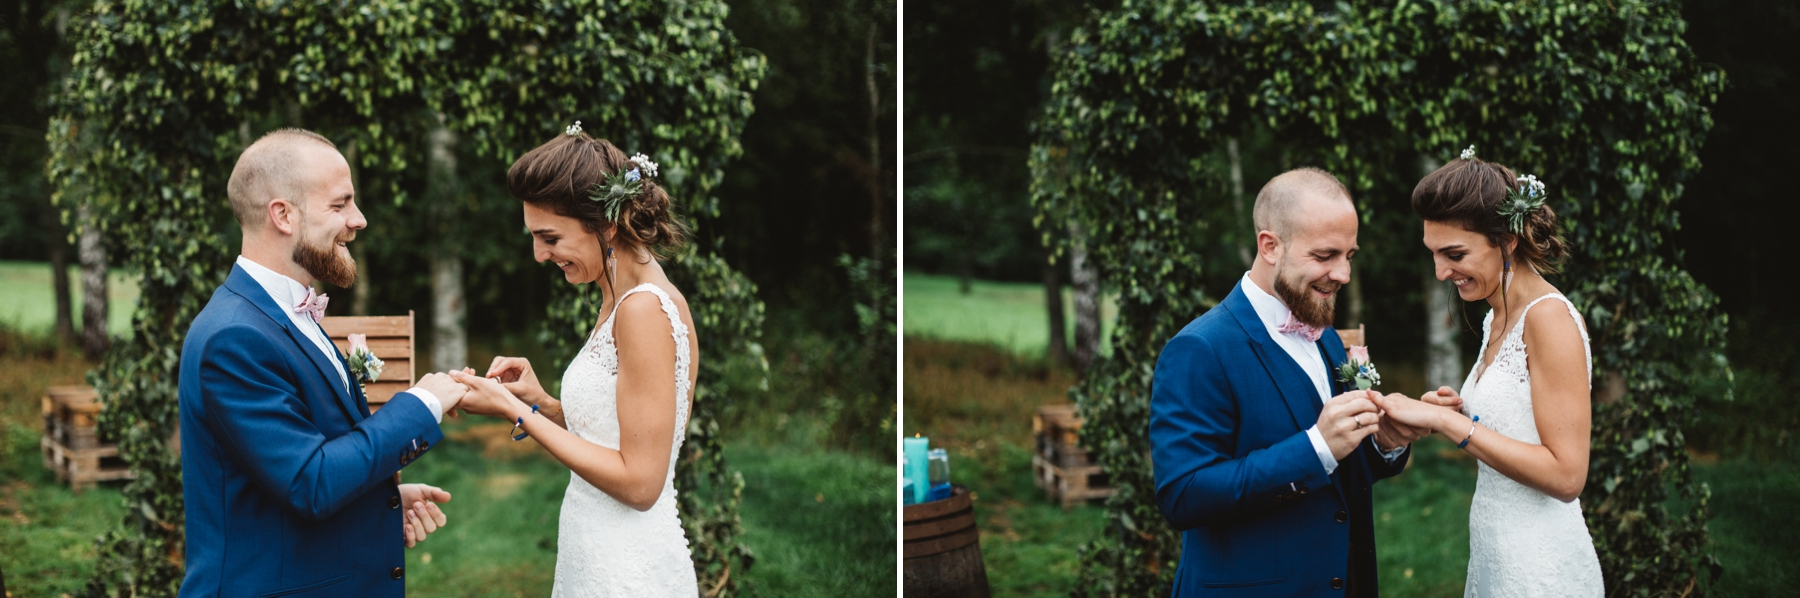 mariage-relais-gensbourg-raphaelmelka-44.jpg